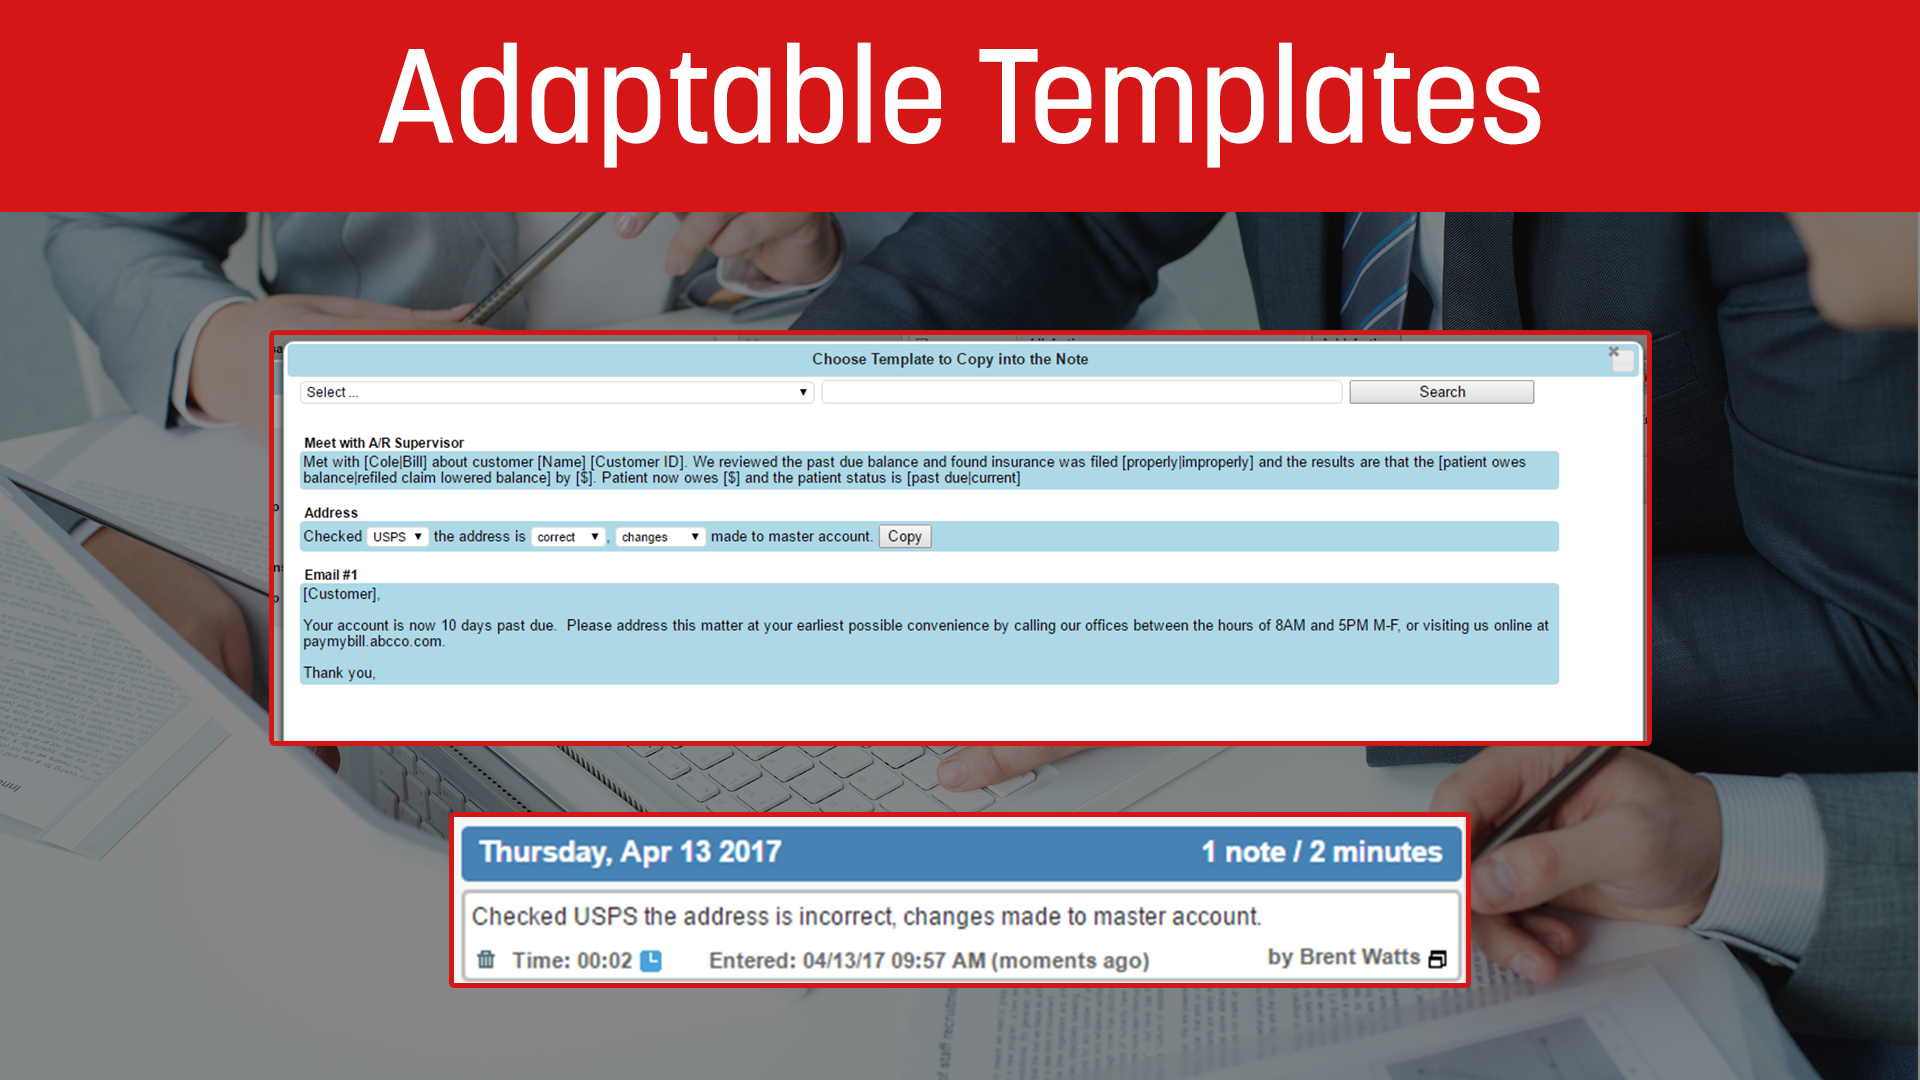 Adaptable Templates